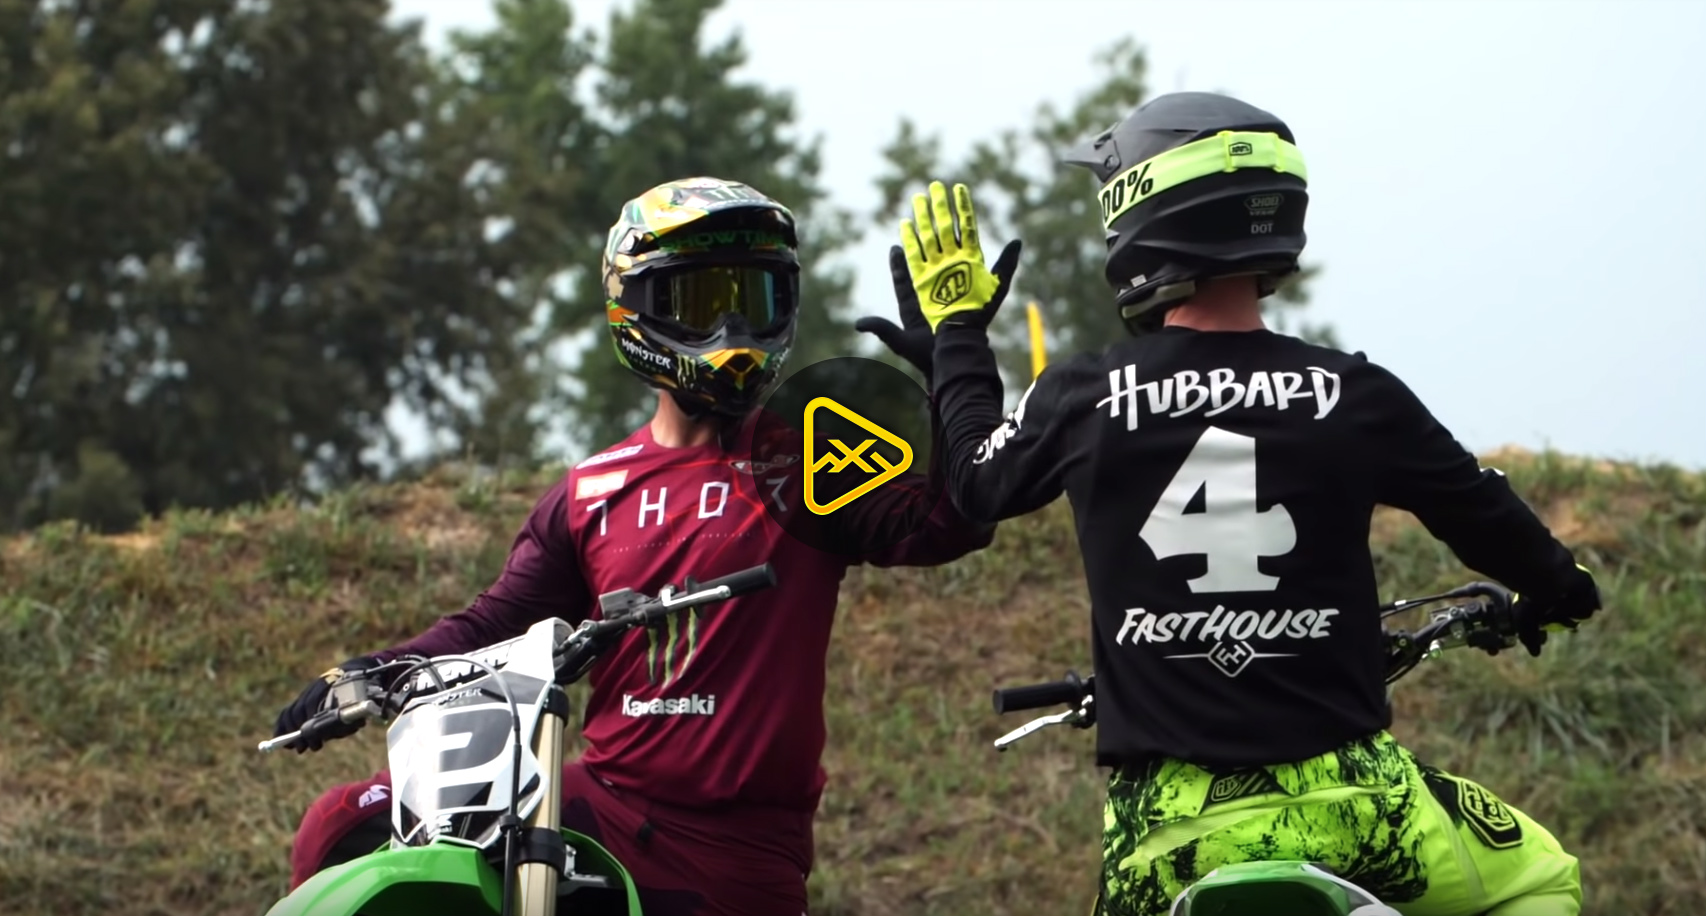 Jeremy McGrath & Tyler Hubbard Ride Hubbard Hills